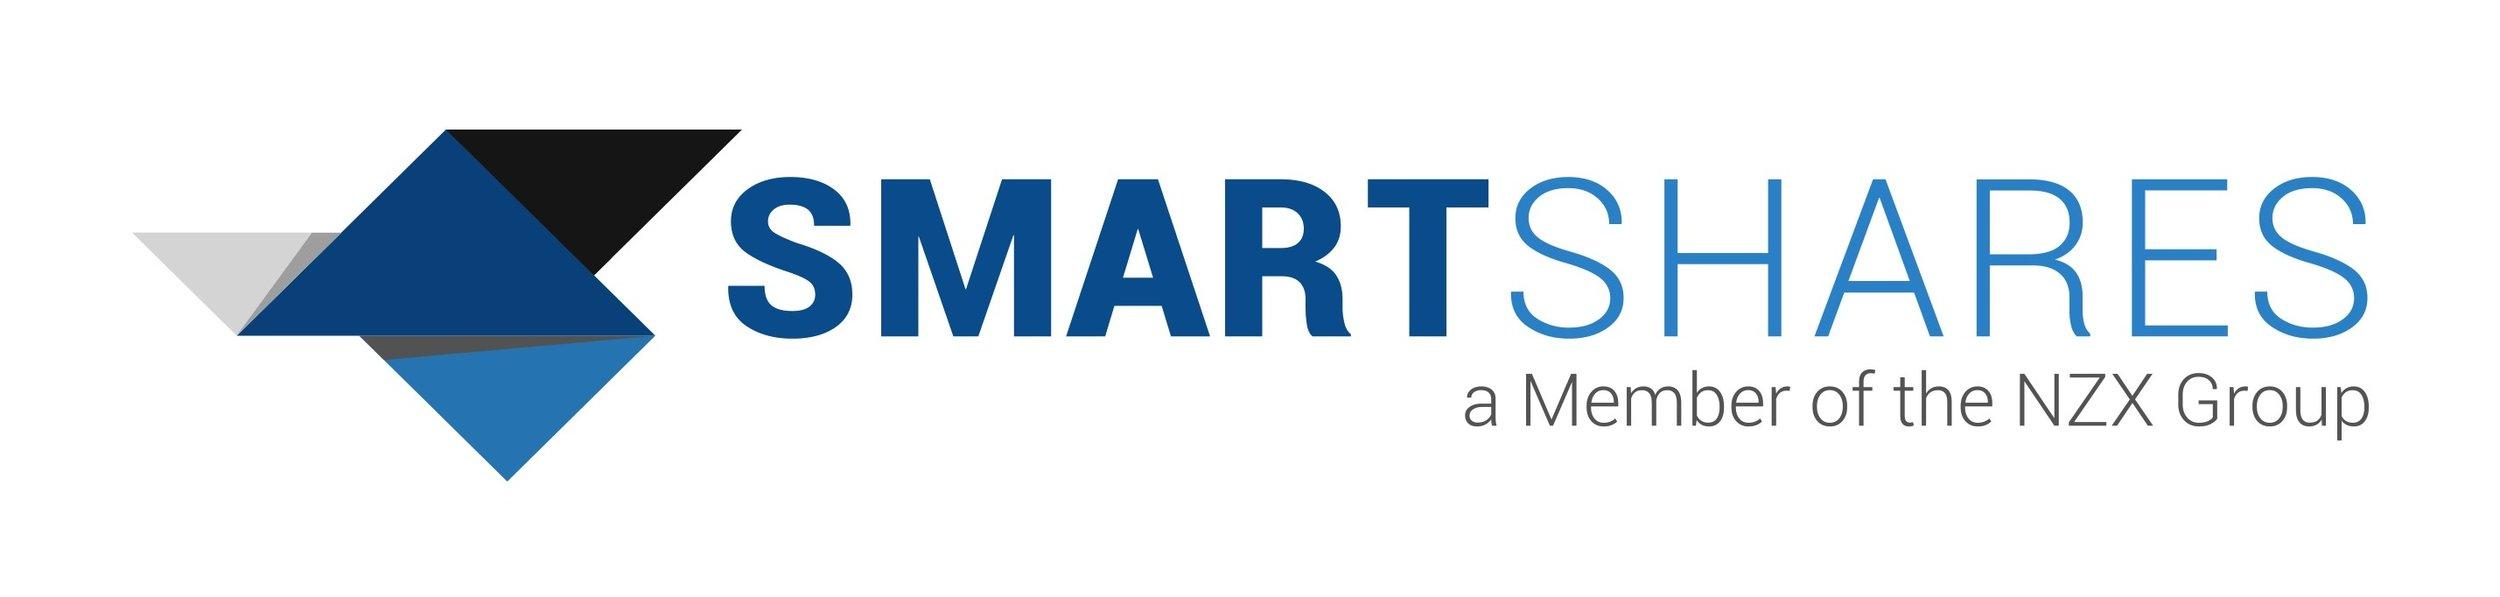 Smartshares (1).jpg